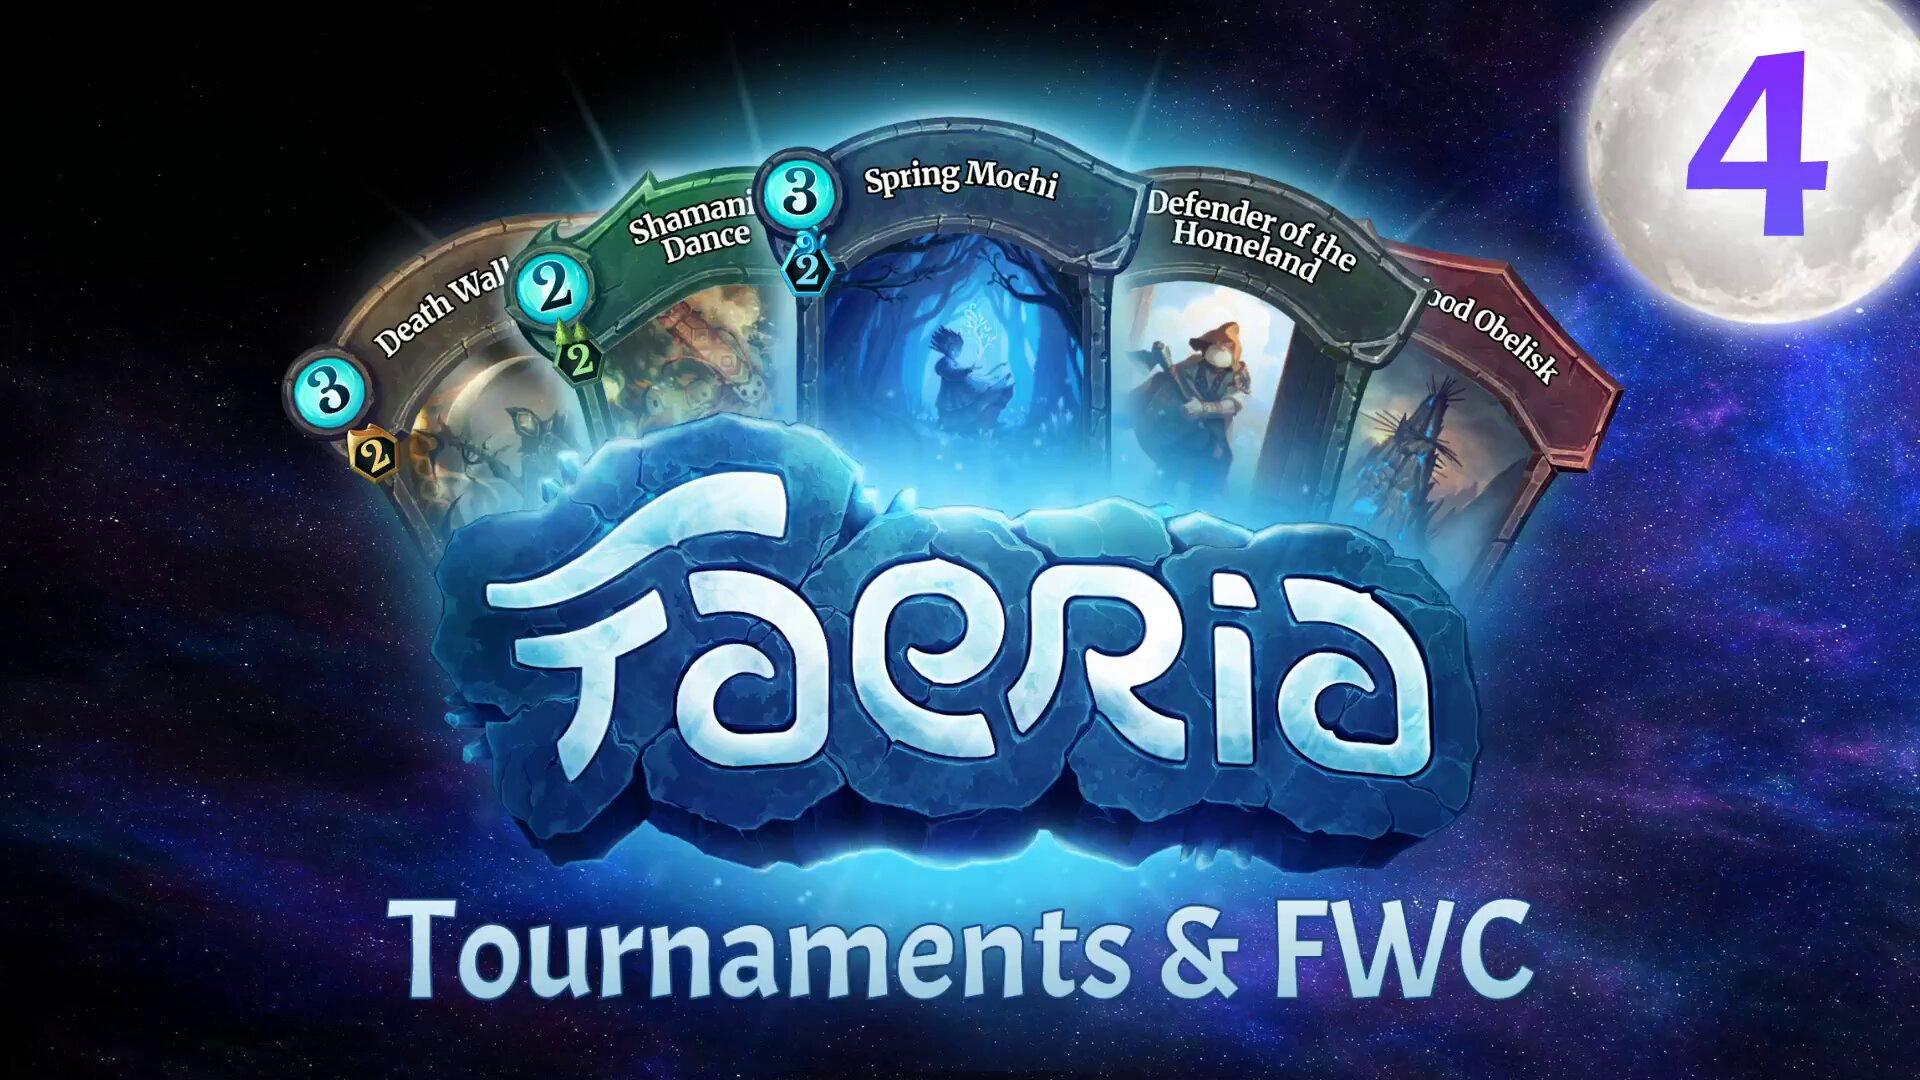 Tournament registration